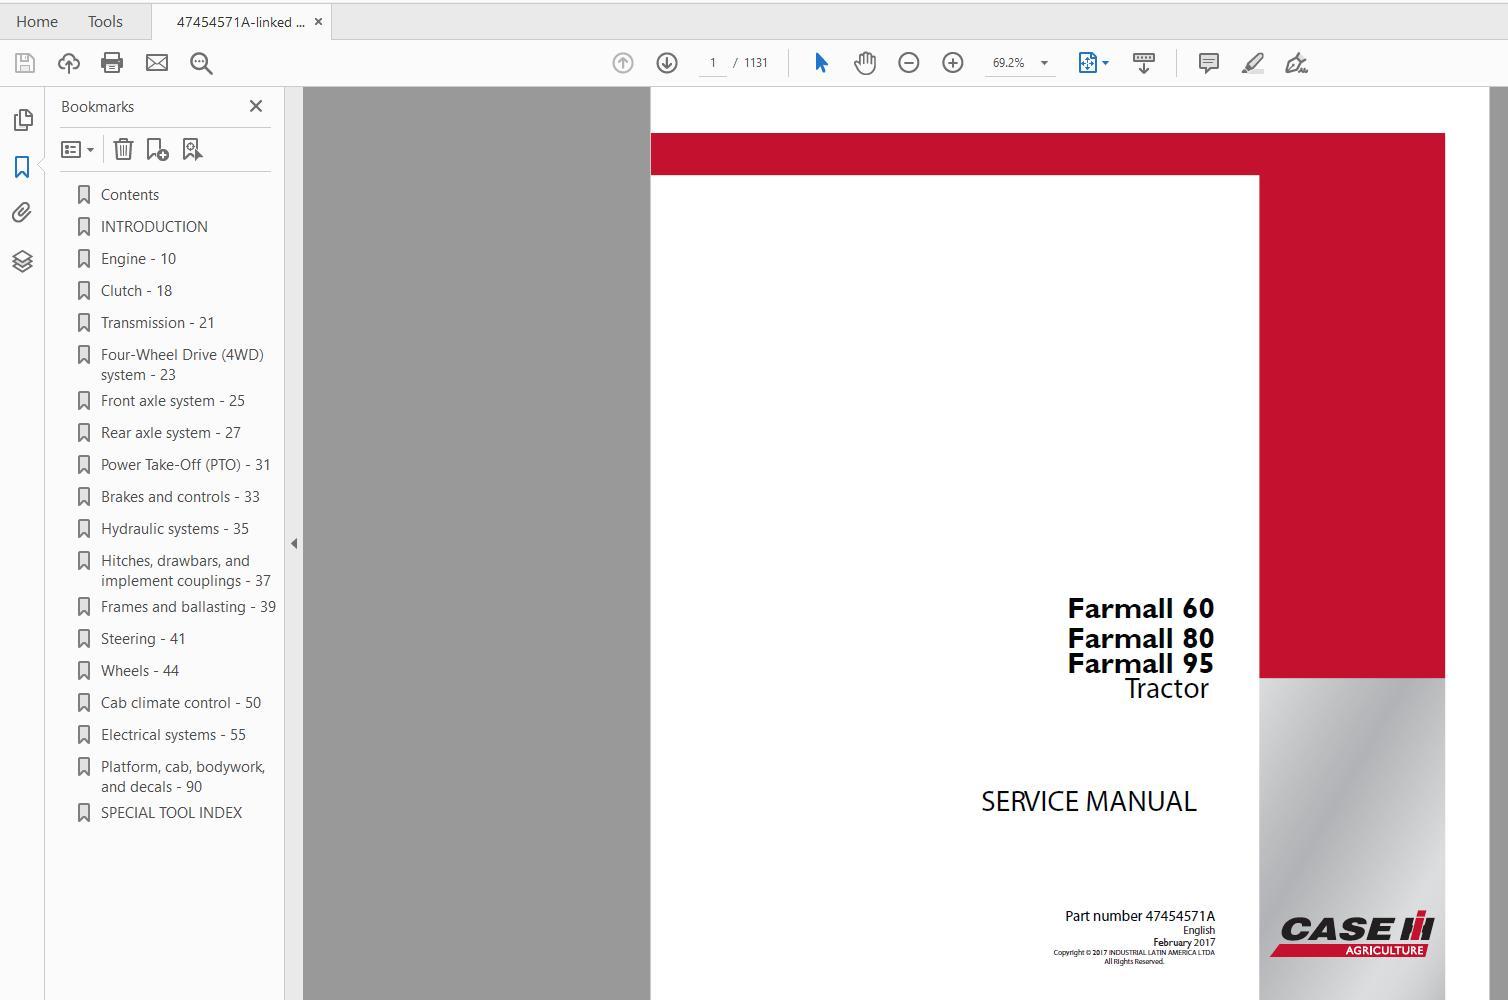 Case_IH_Agricultural_2019_Full_Service_Manual_150Gb5